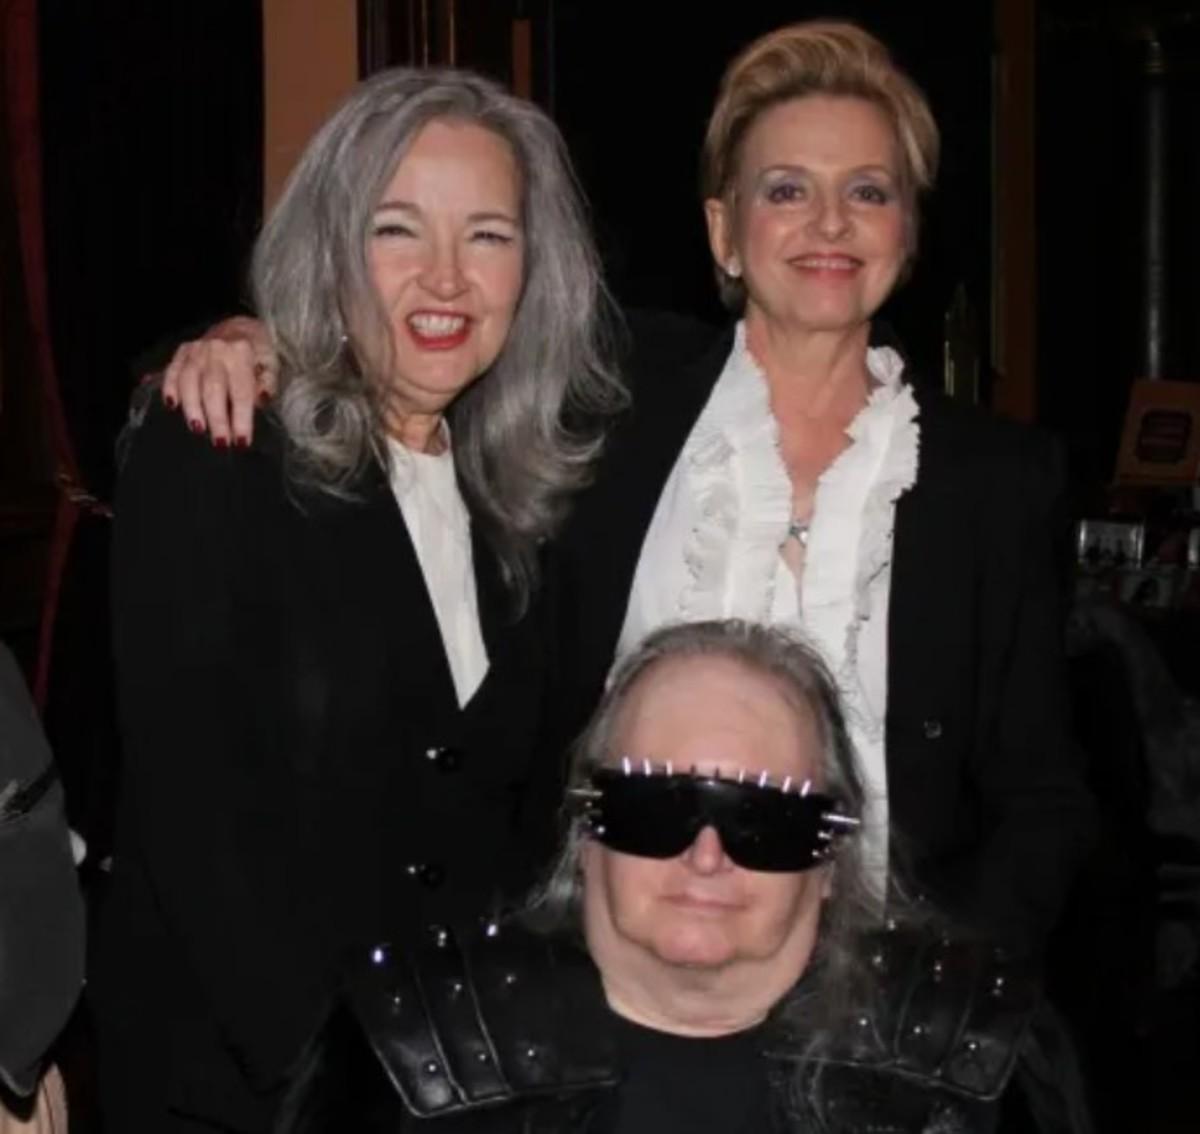 Karla DeVito, Ellen Foley, and Jim Steinman, 2015 photo courtesy of Ellen Foley